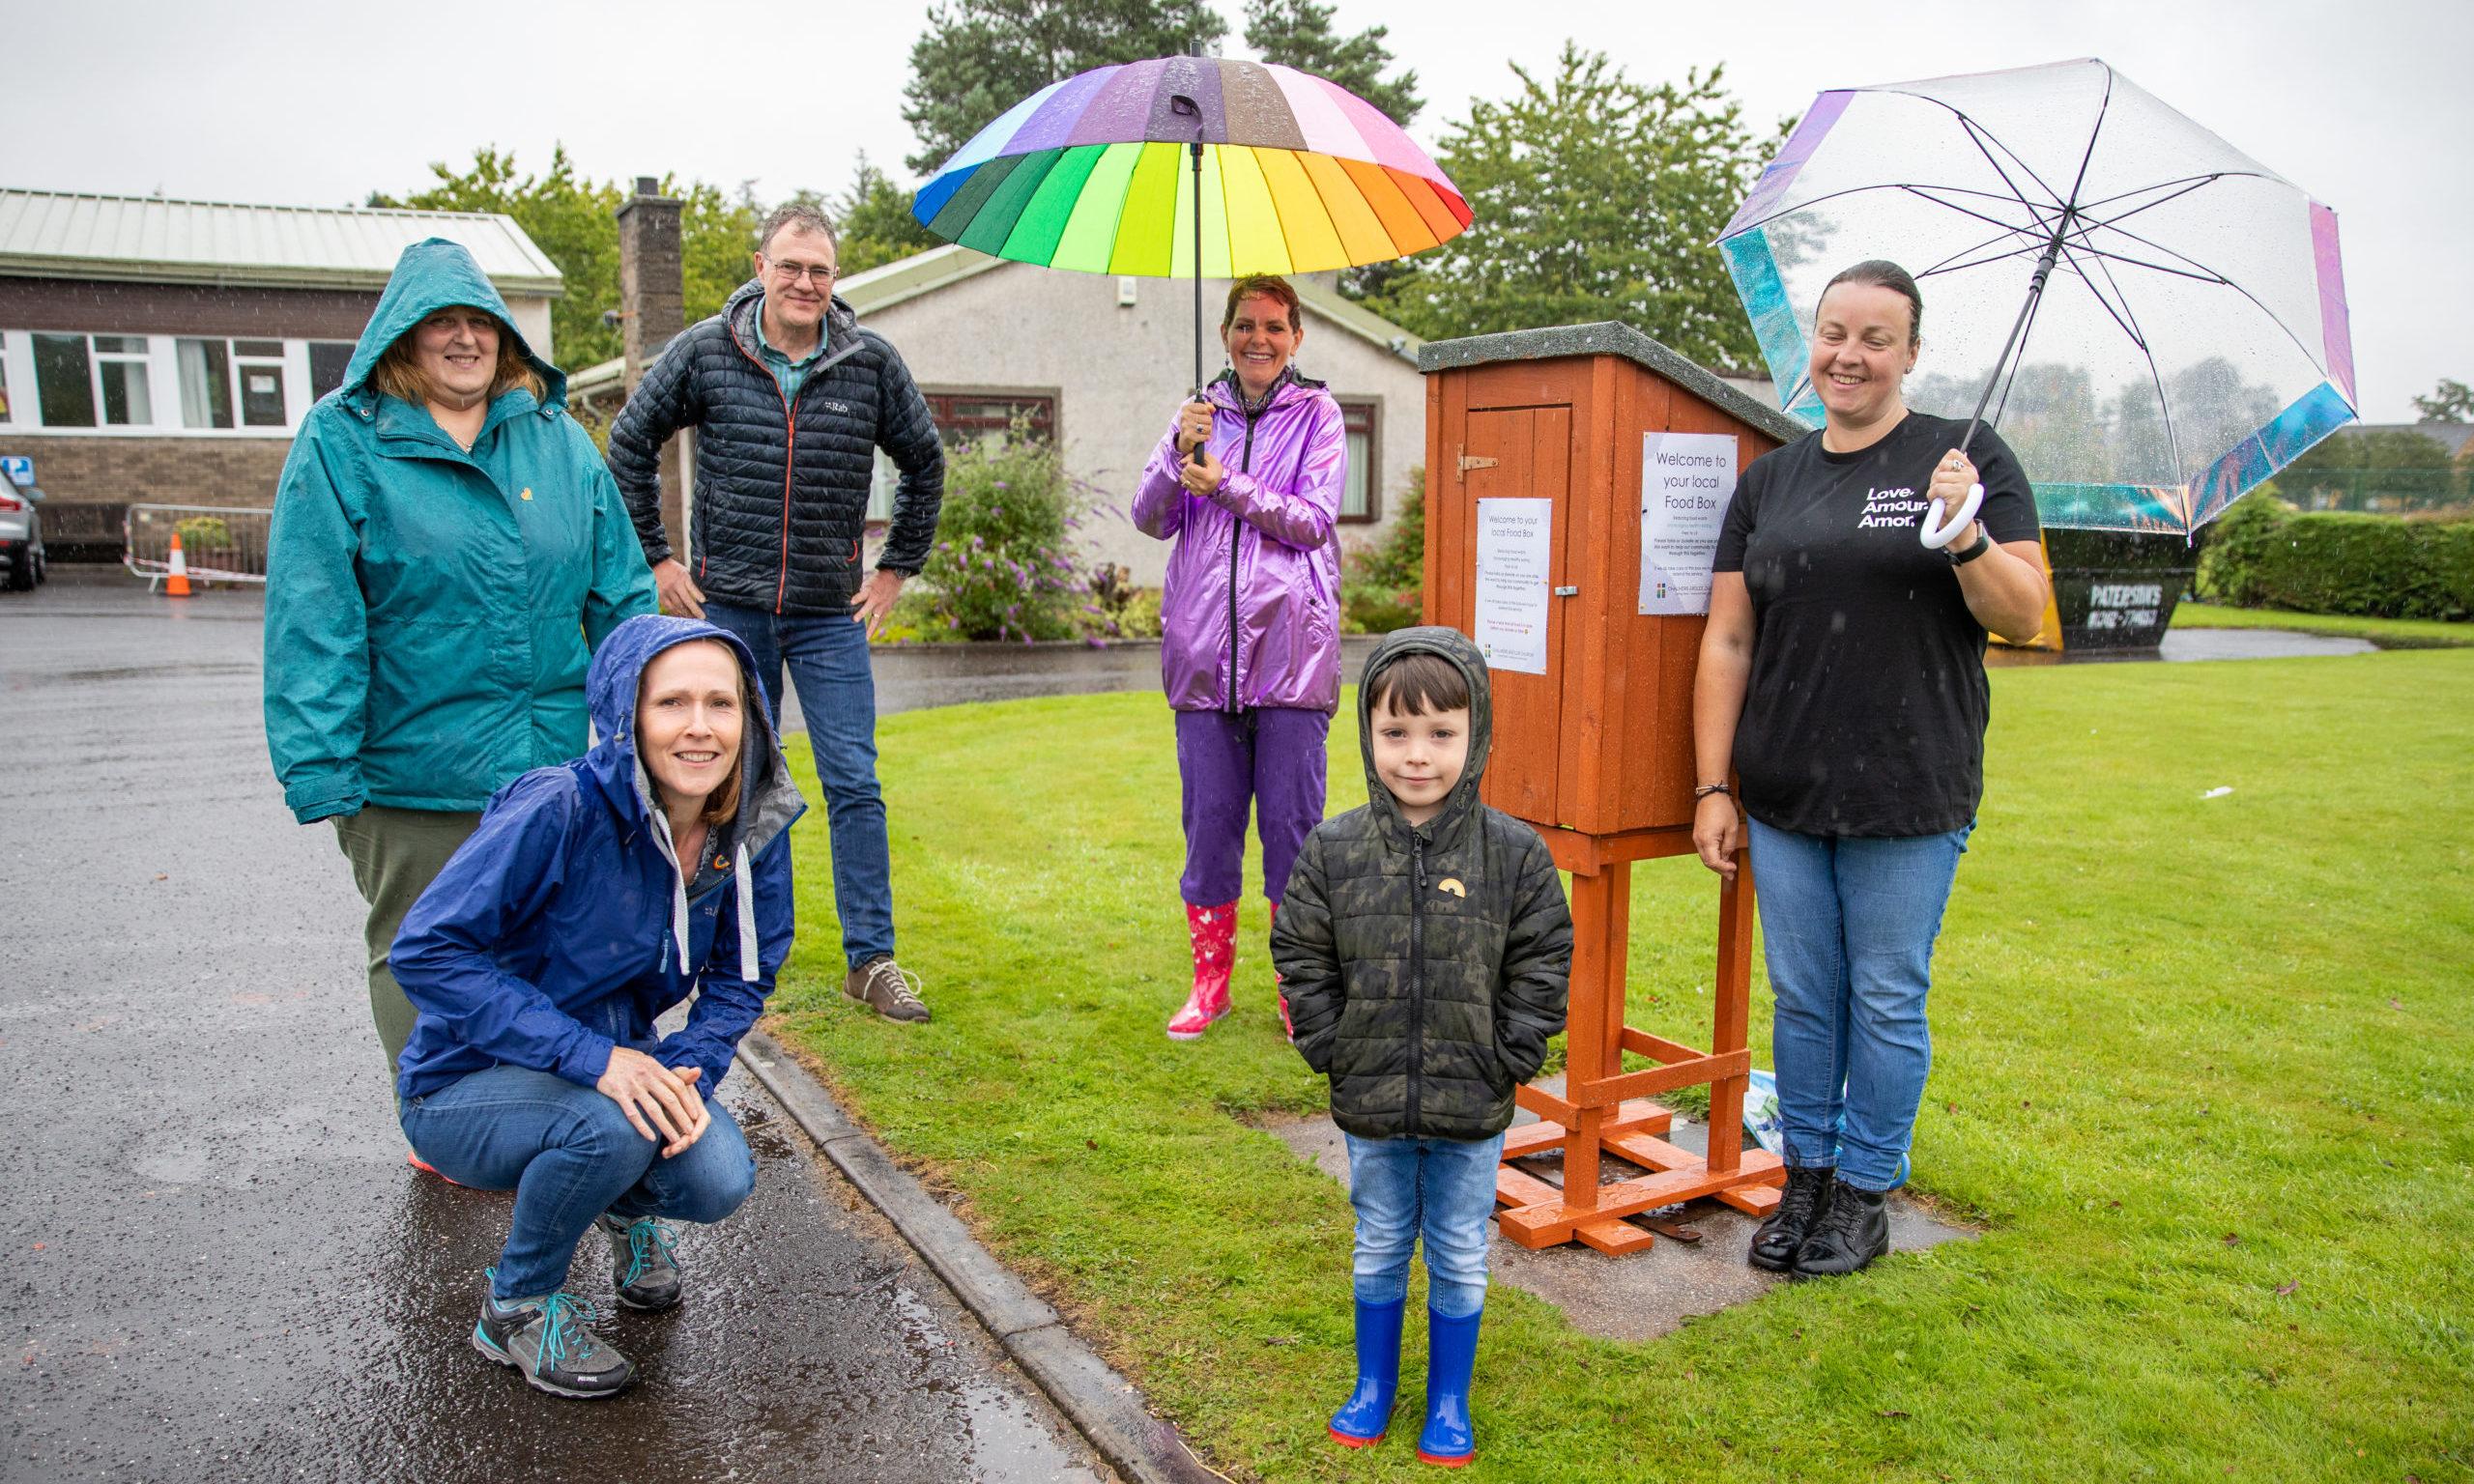 Back row from left: Sheona Chisholm,  Rev Jonathan Humphrey, Melanie Jane Harrison and Glenda Watt. Front; Kate Humphrey and Cohenn Watt, at the community food box.